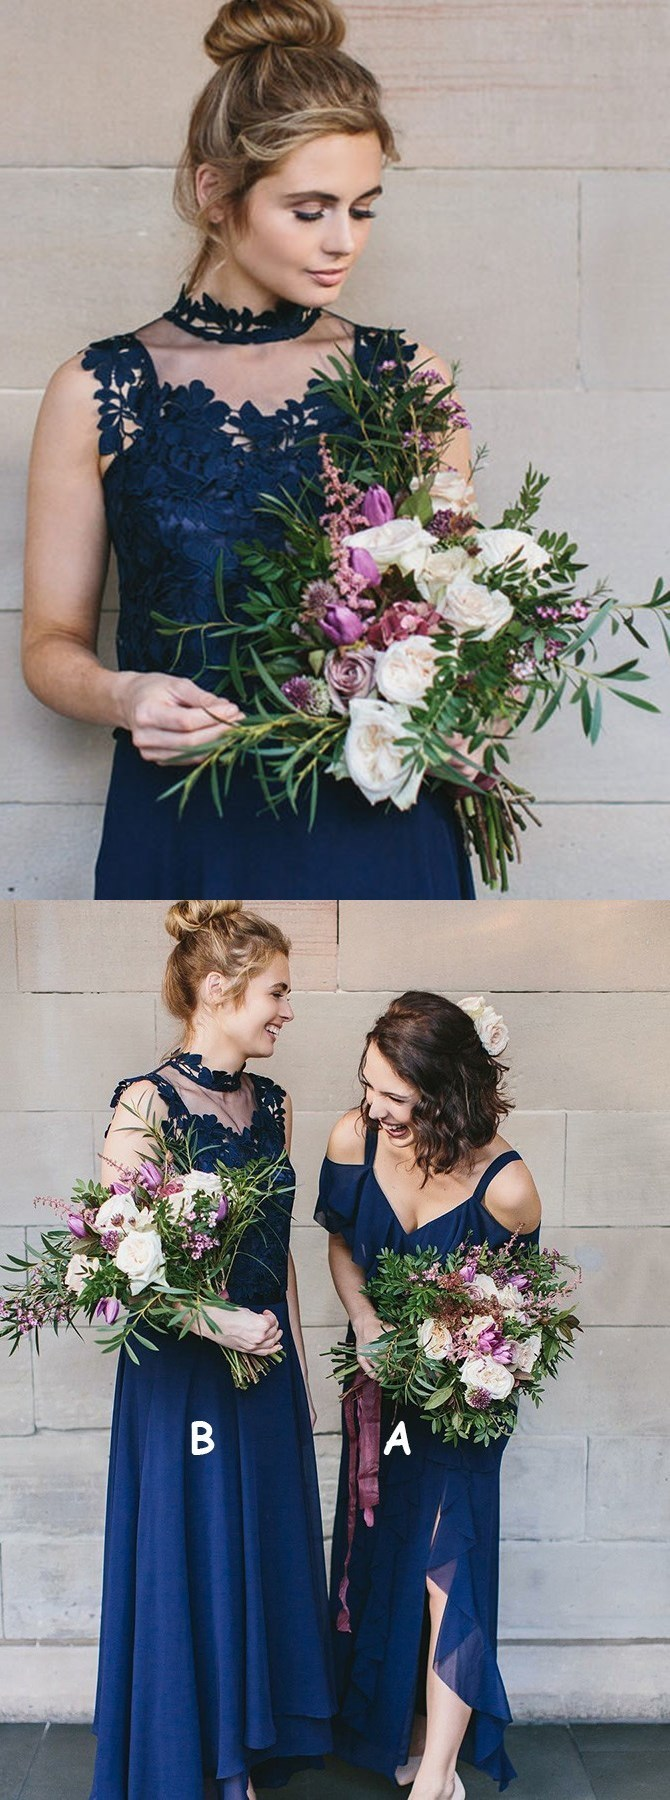 Elegant royal blue formal party dresses, special mismatched bridesmaid dresses